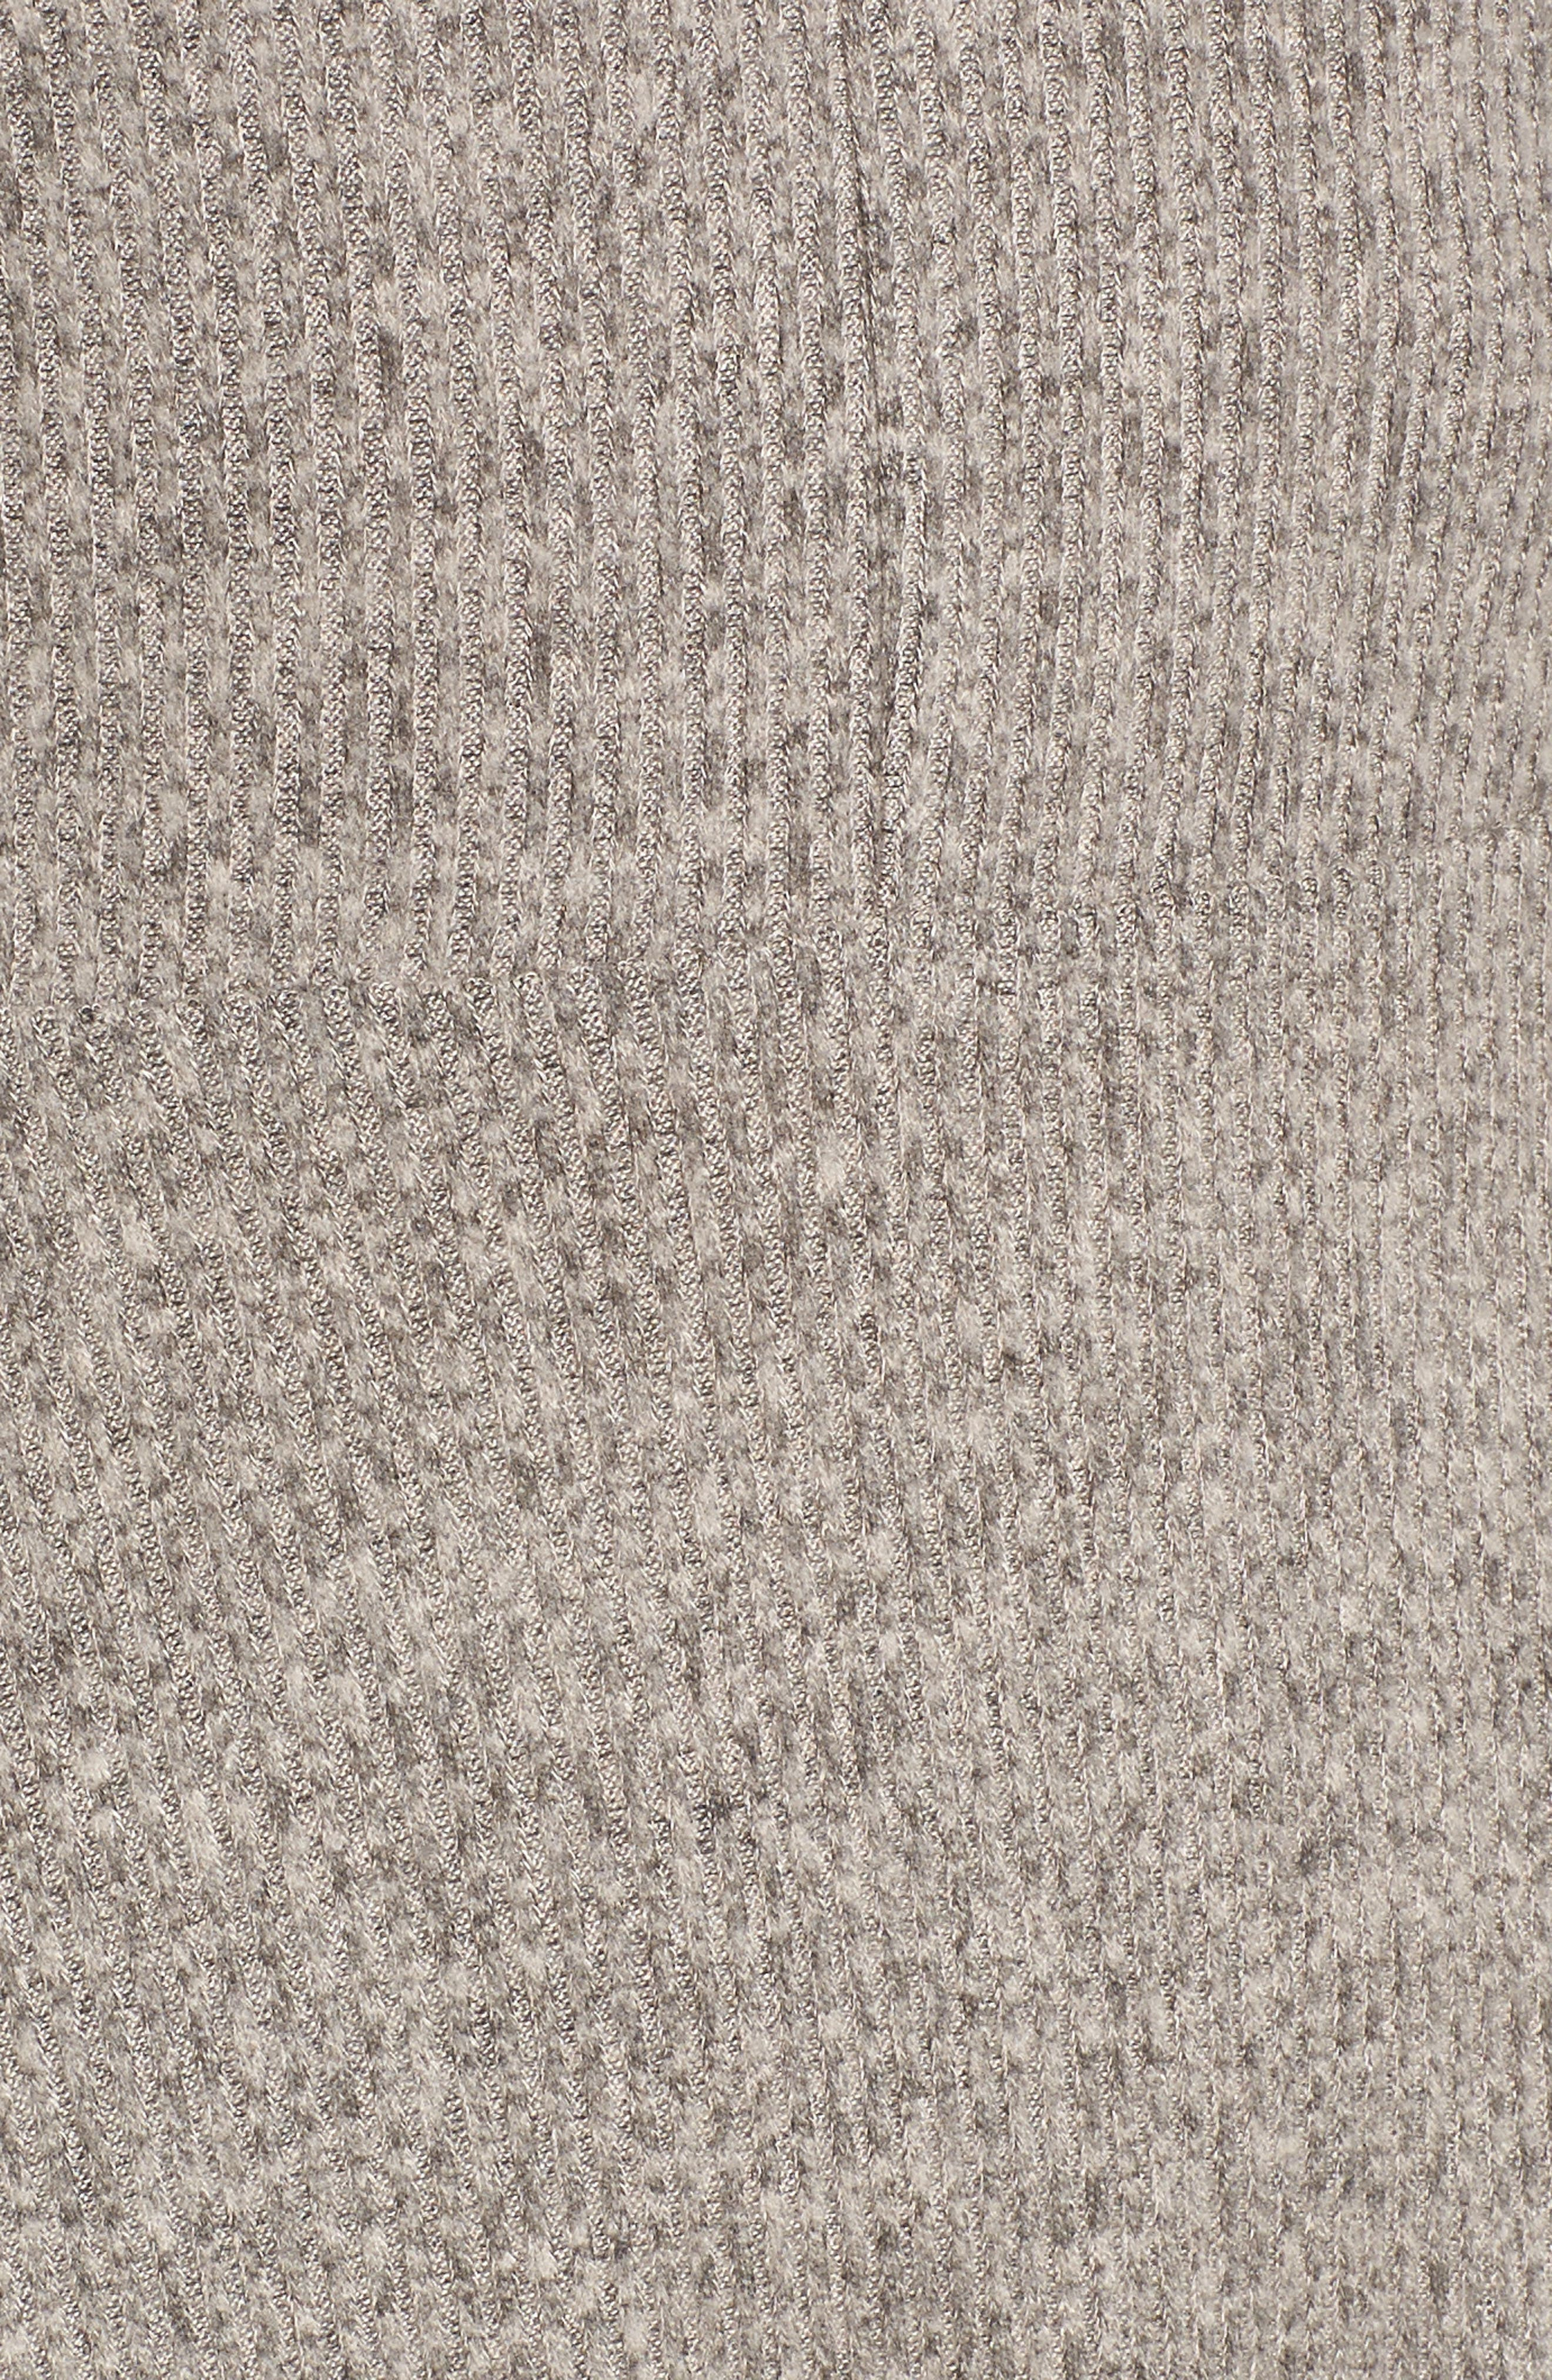 Choker Neck Cold Shoulder Midi Dress,                             Alternate thumbnail 5, color,